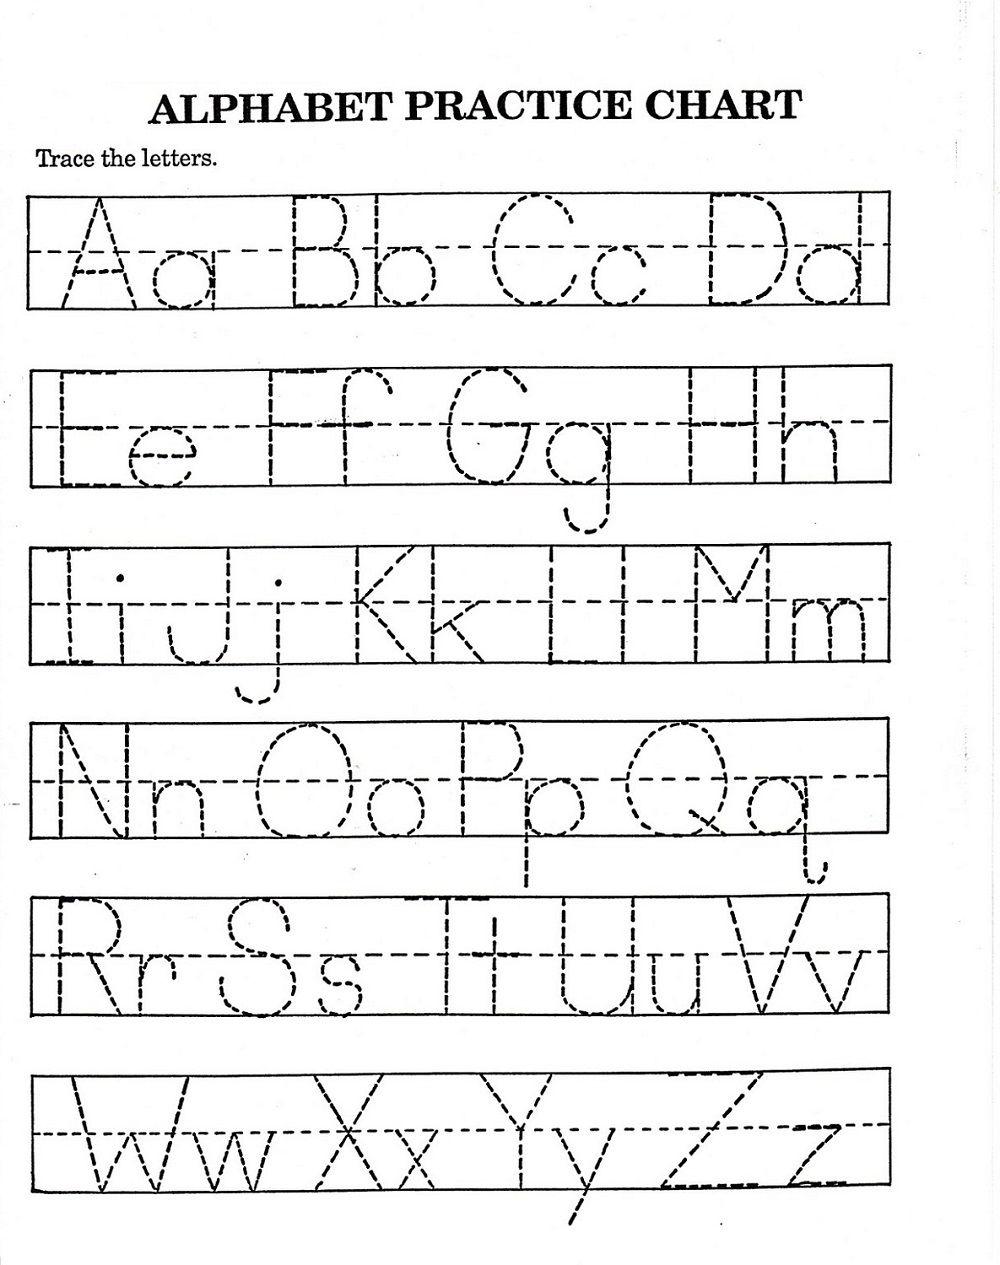 Az Worksheets For Kindergarten Traceable Alphabet Z Activity pertaining to Letter Tracing Worksheets A-Z Pdf